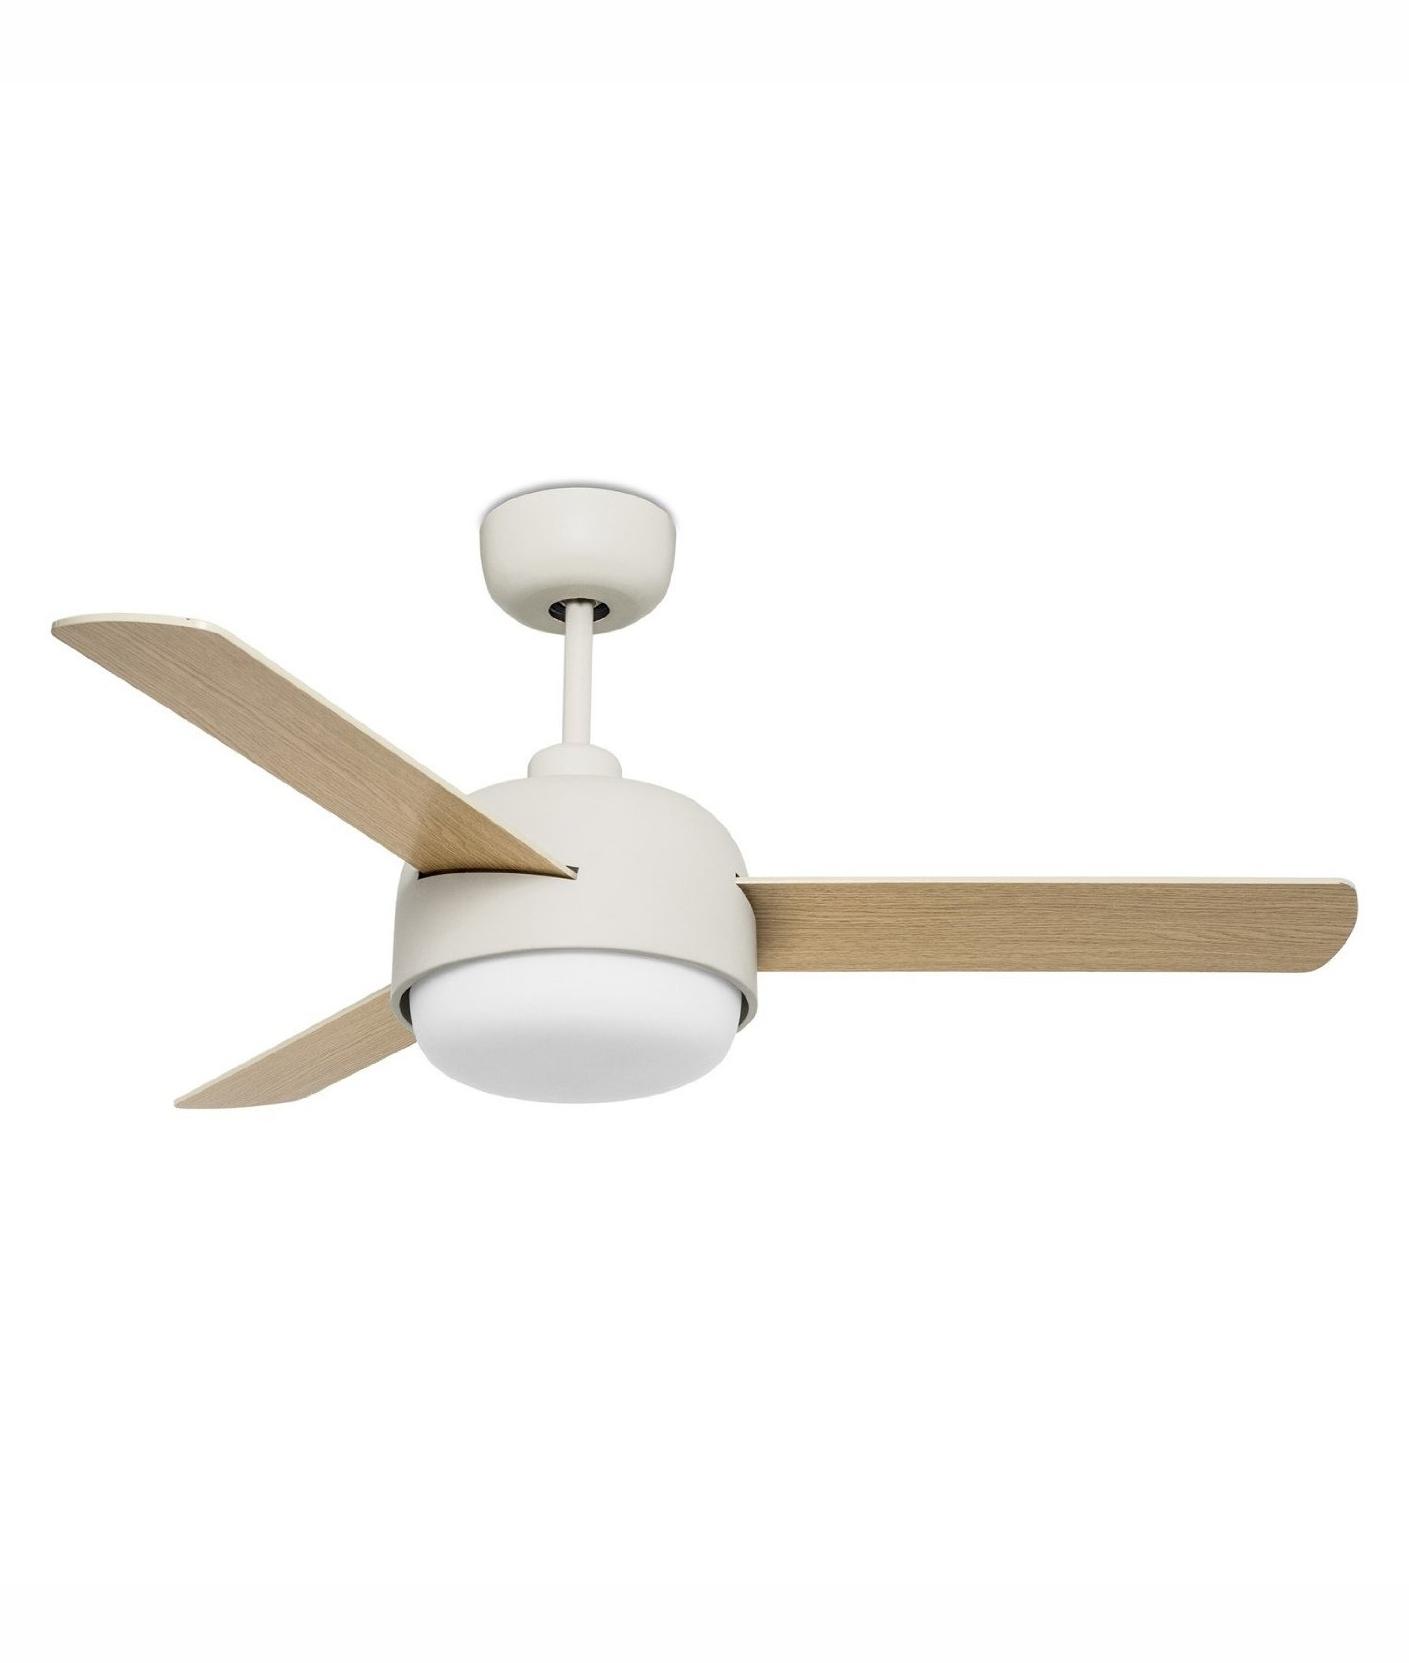 Wood Effect Bladed Ceiling Fan Reversible Function